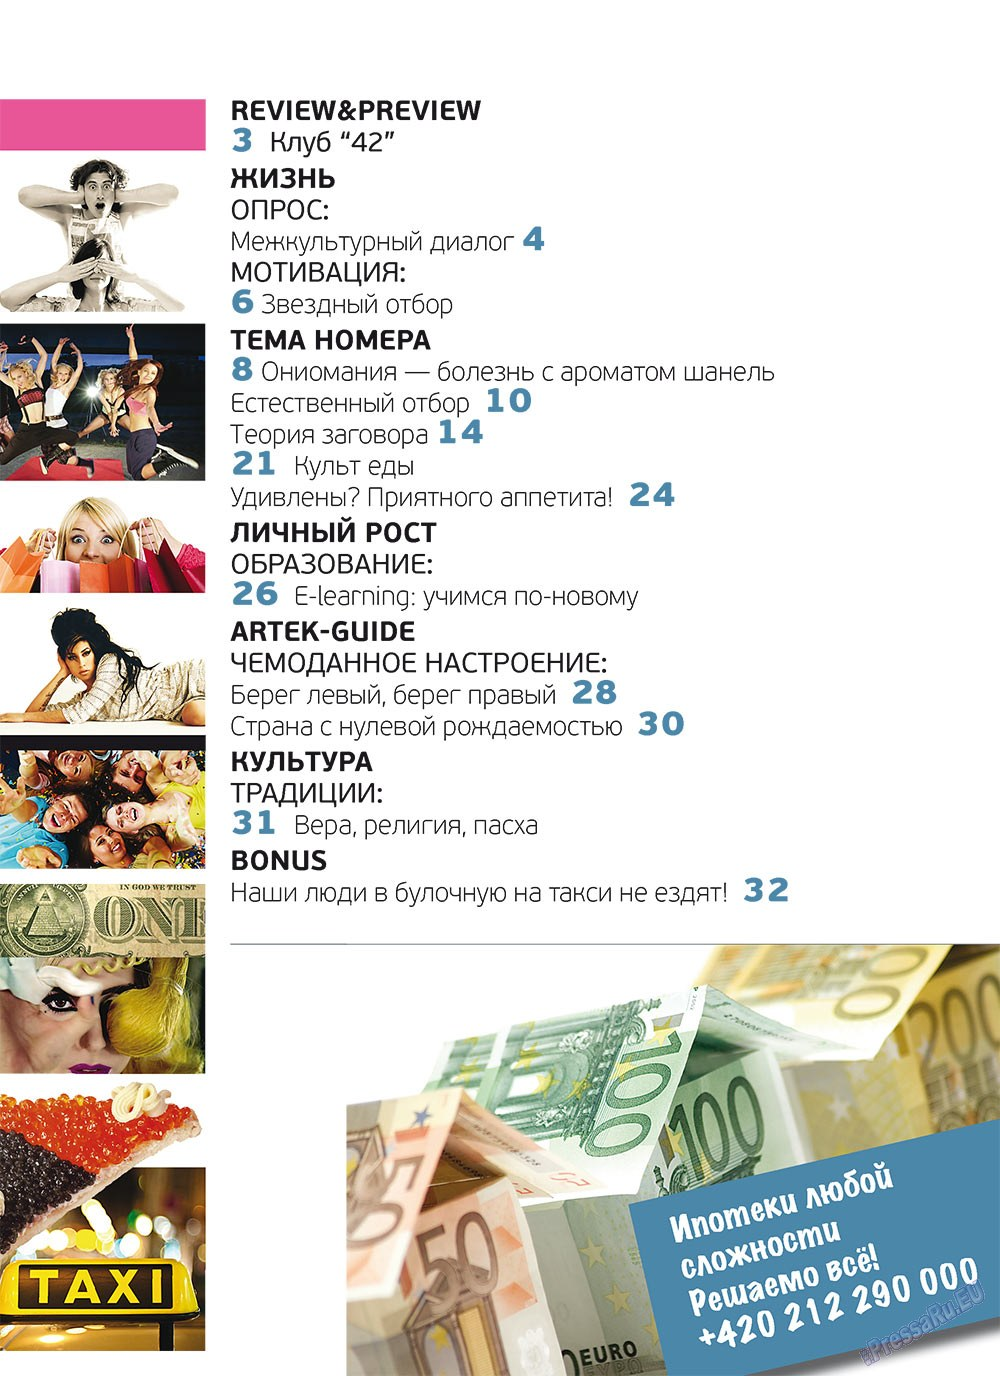 Артек (журнал). 2011 год, номер 4, стр. 3